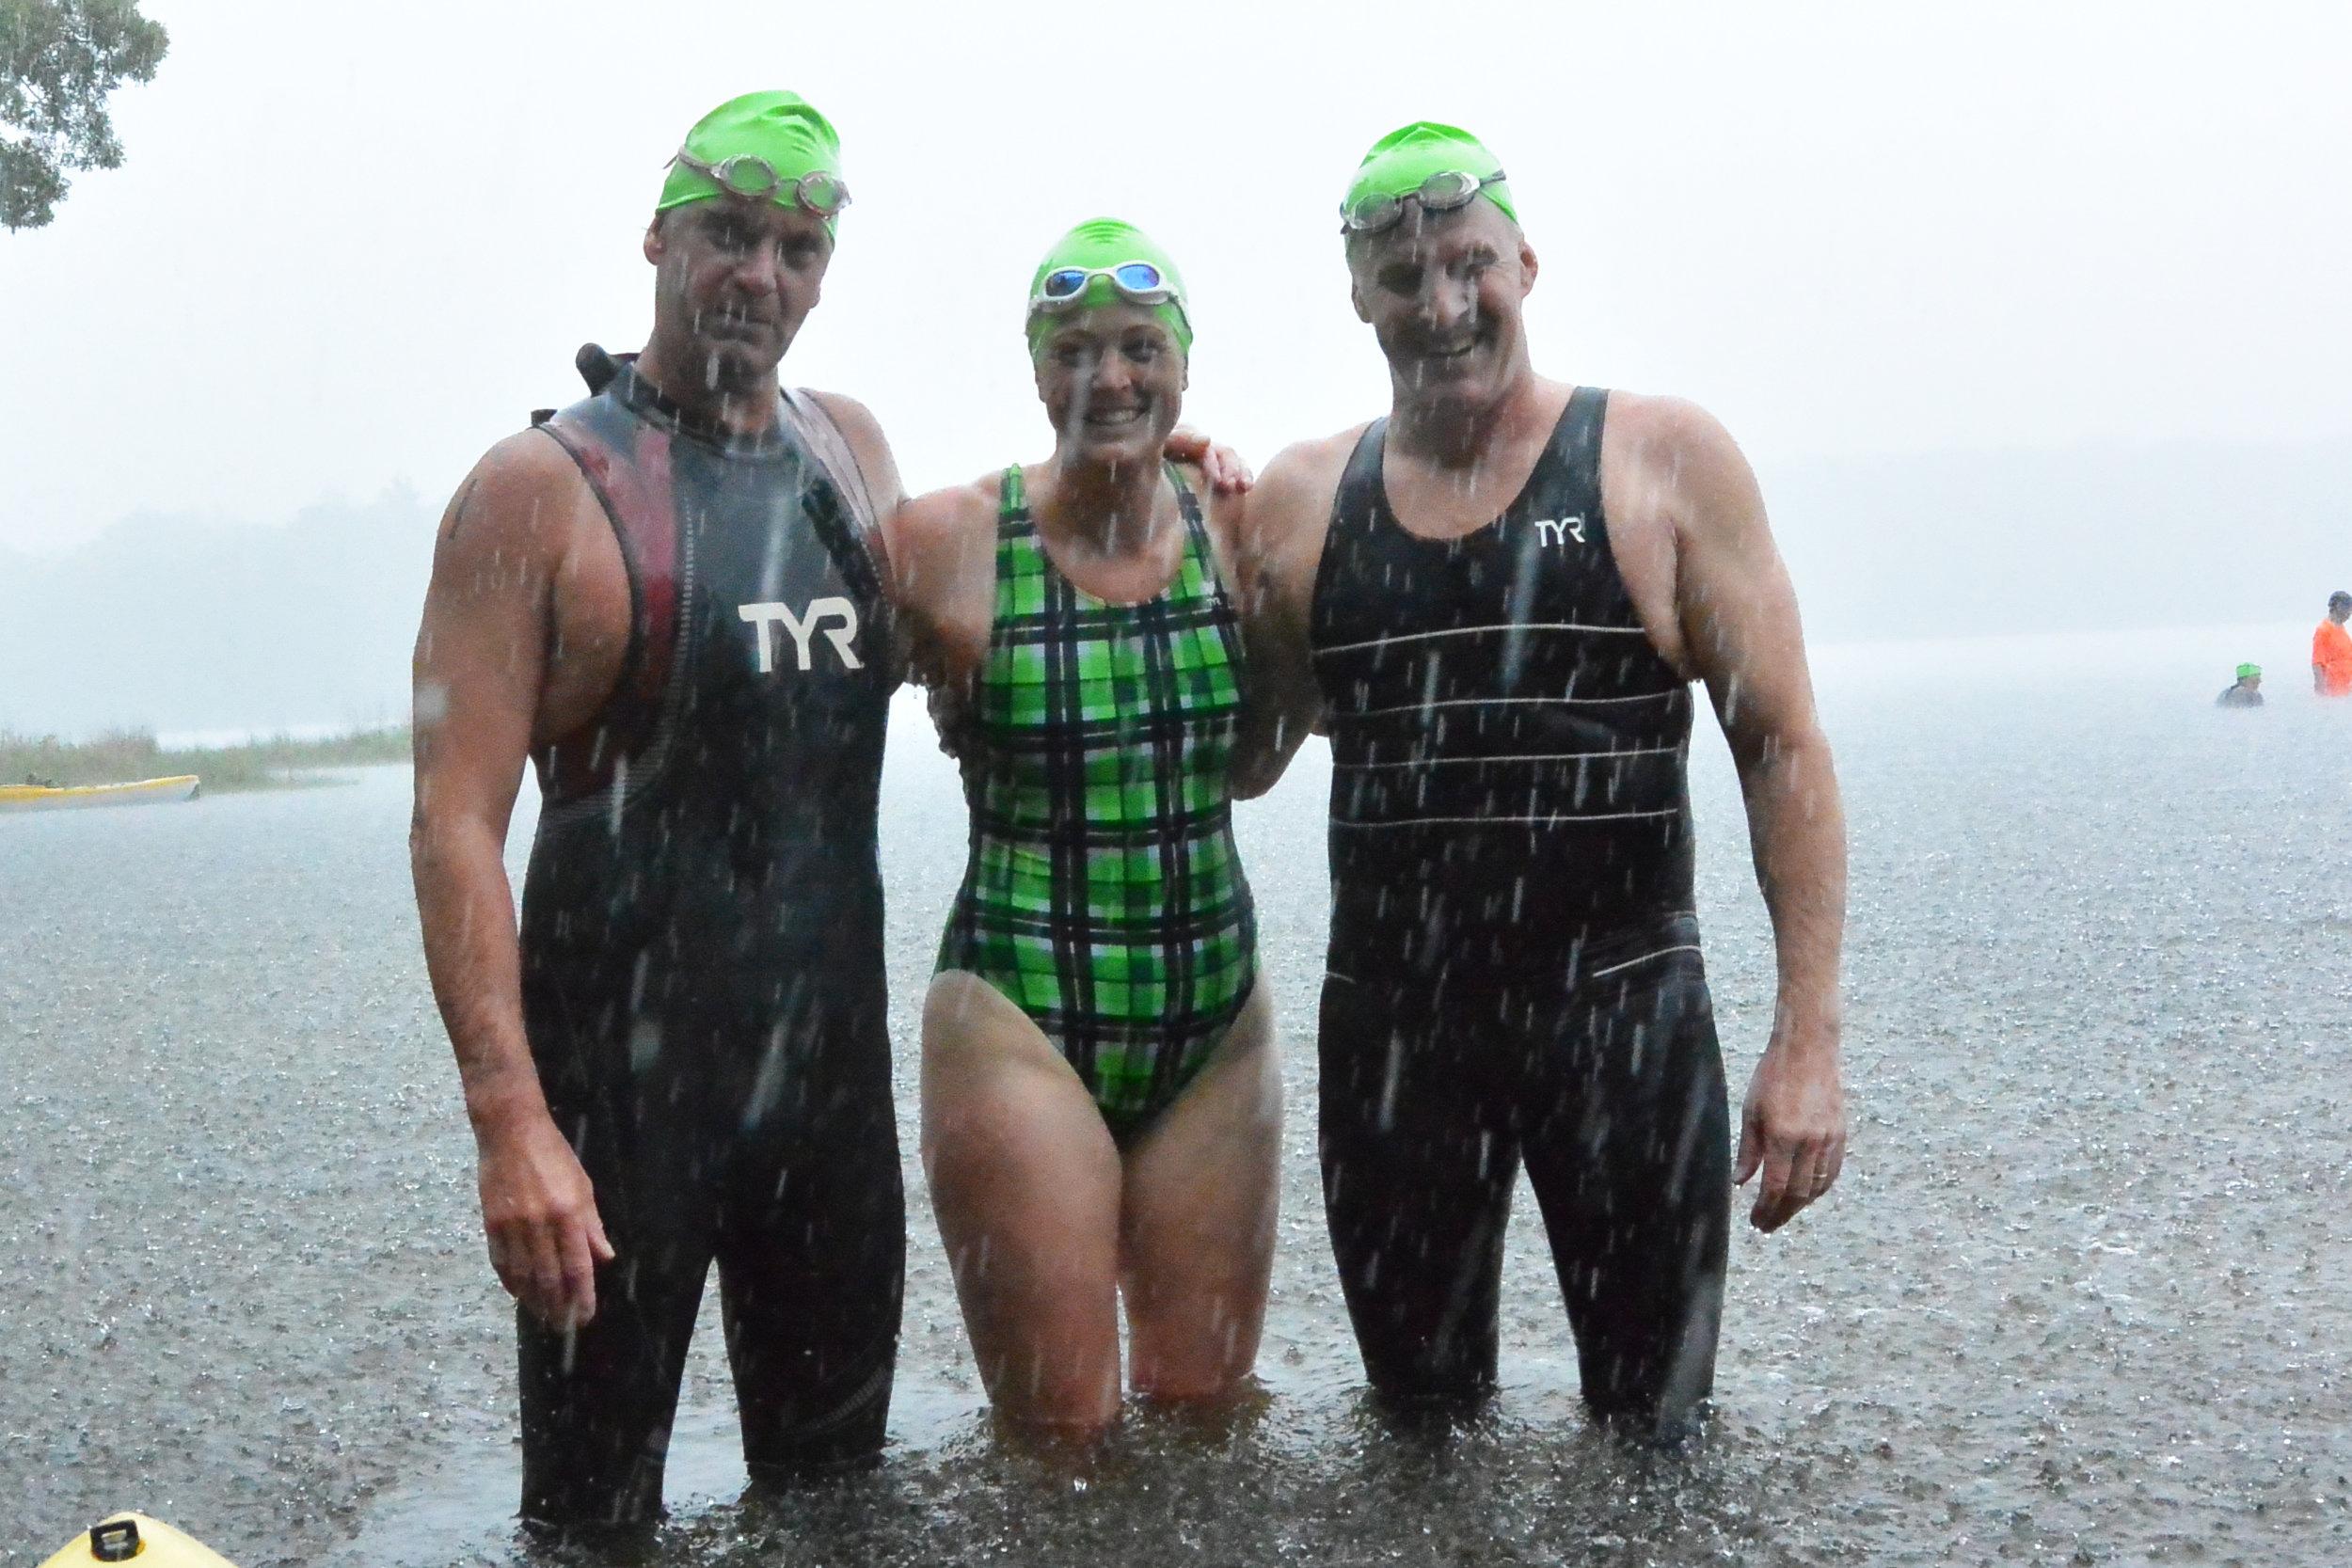 2017 Narrow River Turnaround Swim first place finishers (L to R)Stuart Cromarty, Diane Leith Doucett, and Matt Gilson. Photo credit: Frank McQuiggan